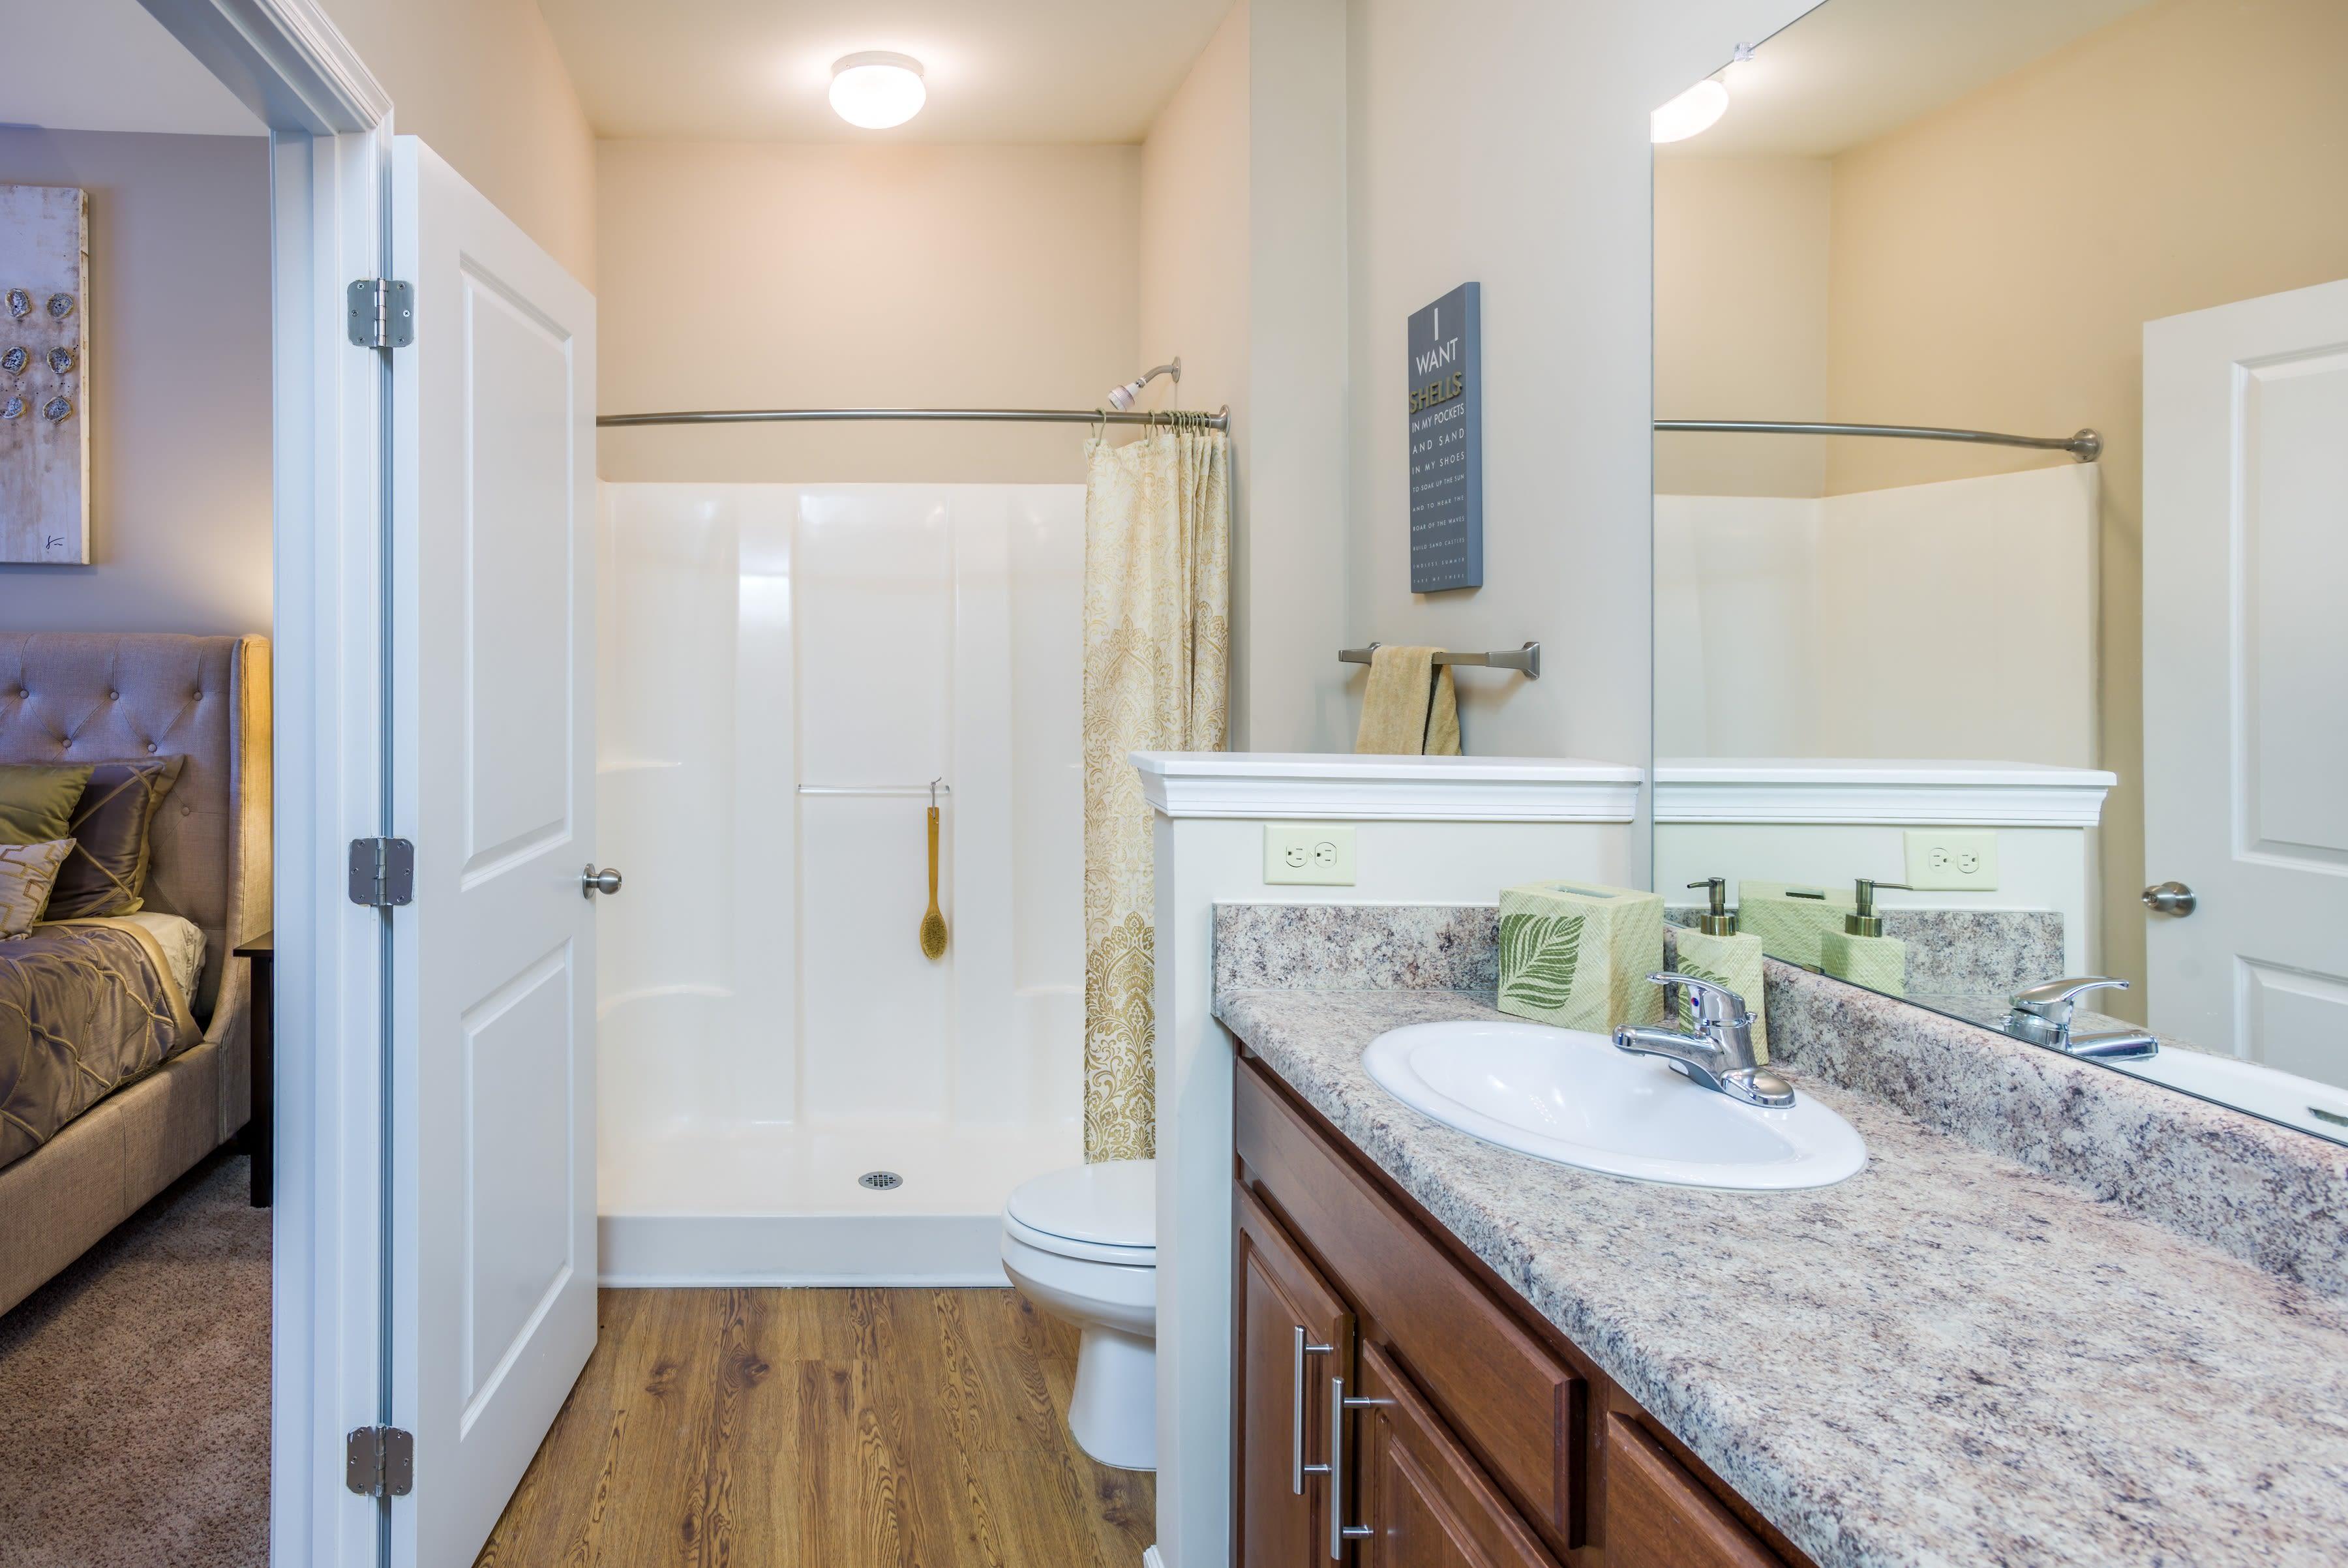 Bathroom at Arbor Village in Summerville, South Carolina